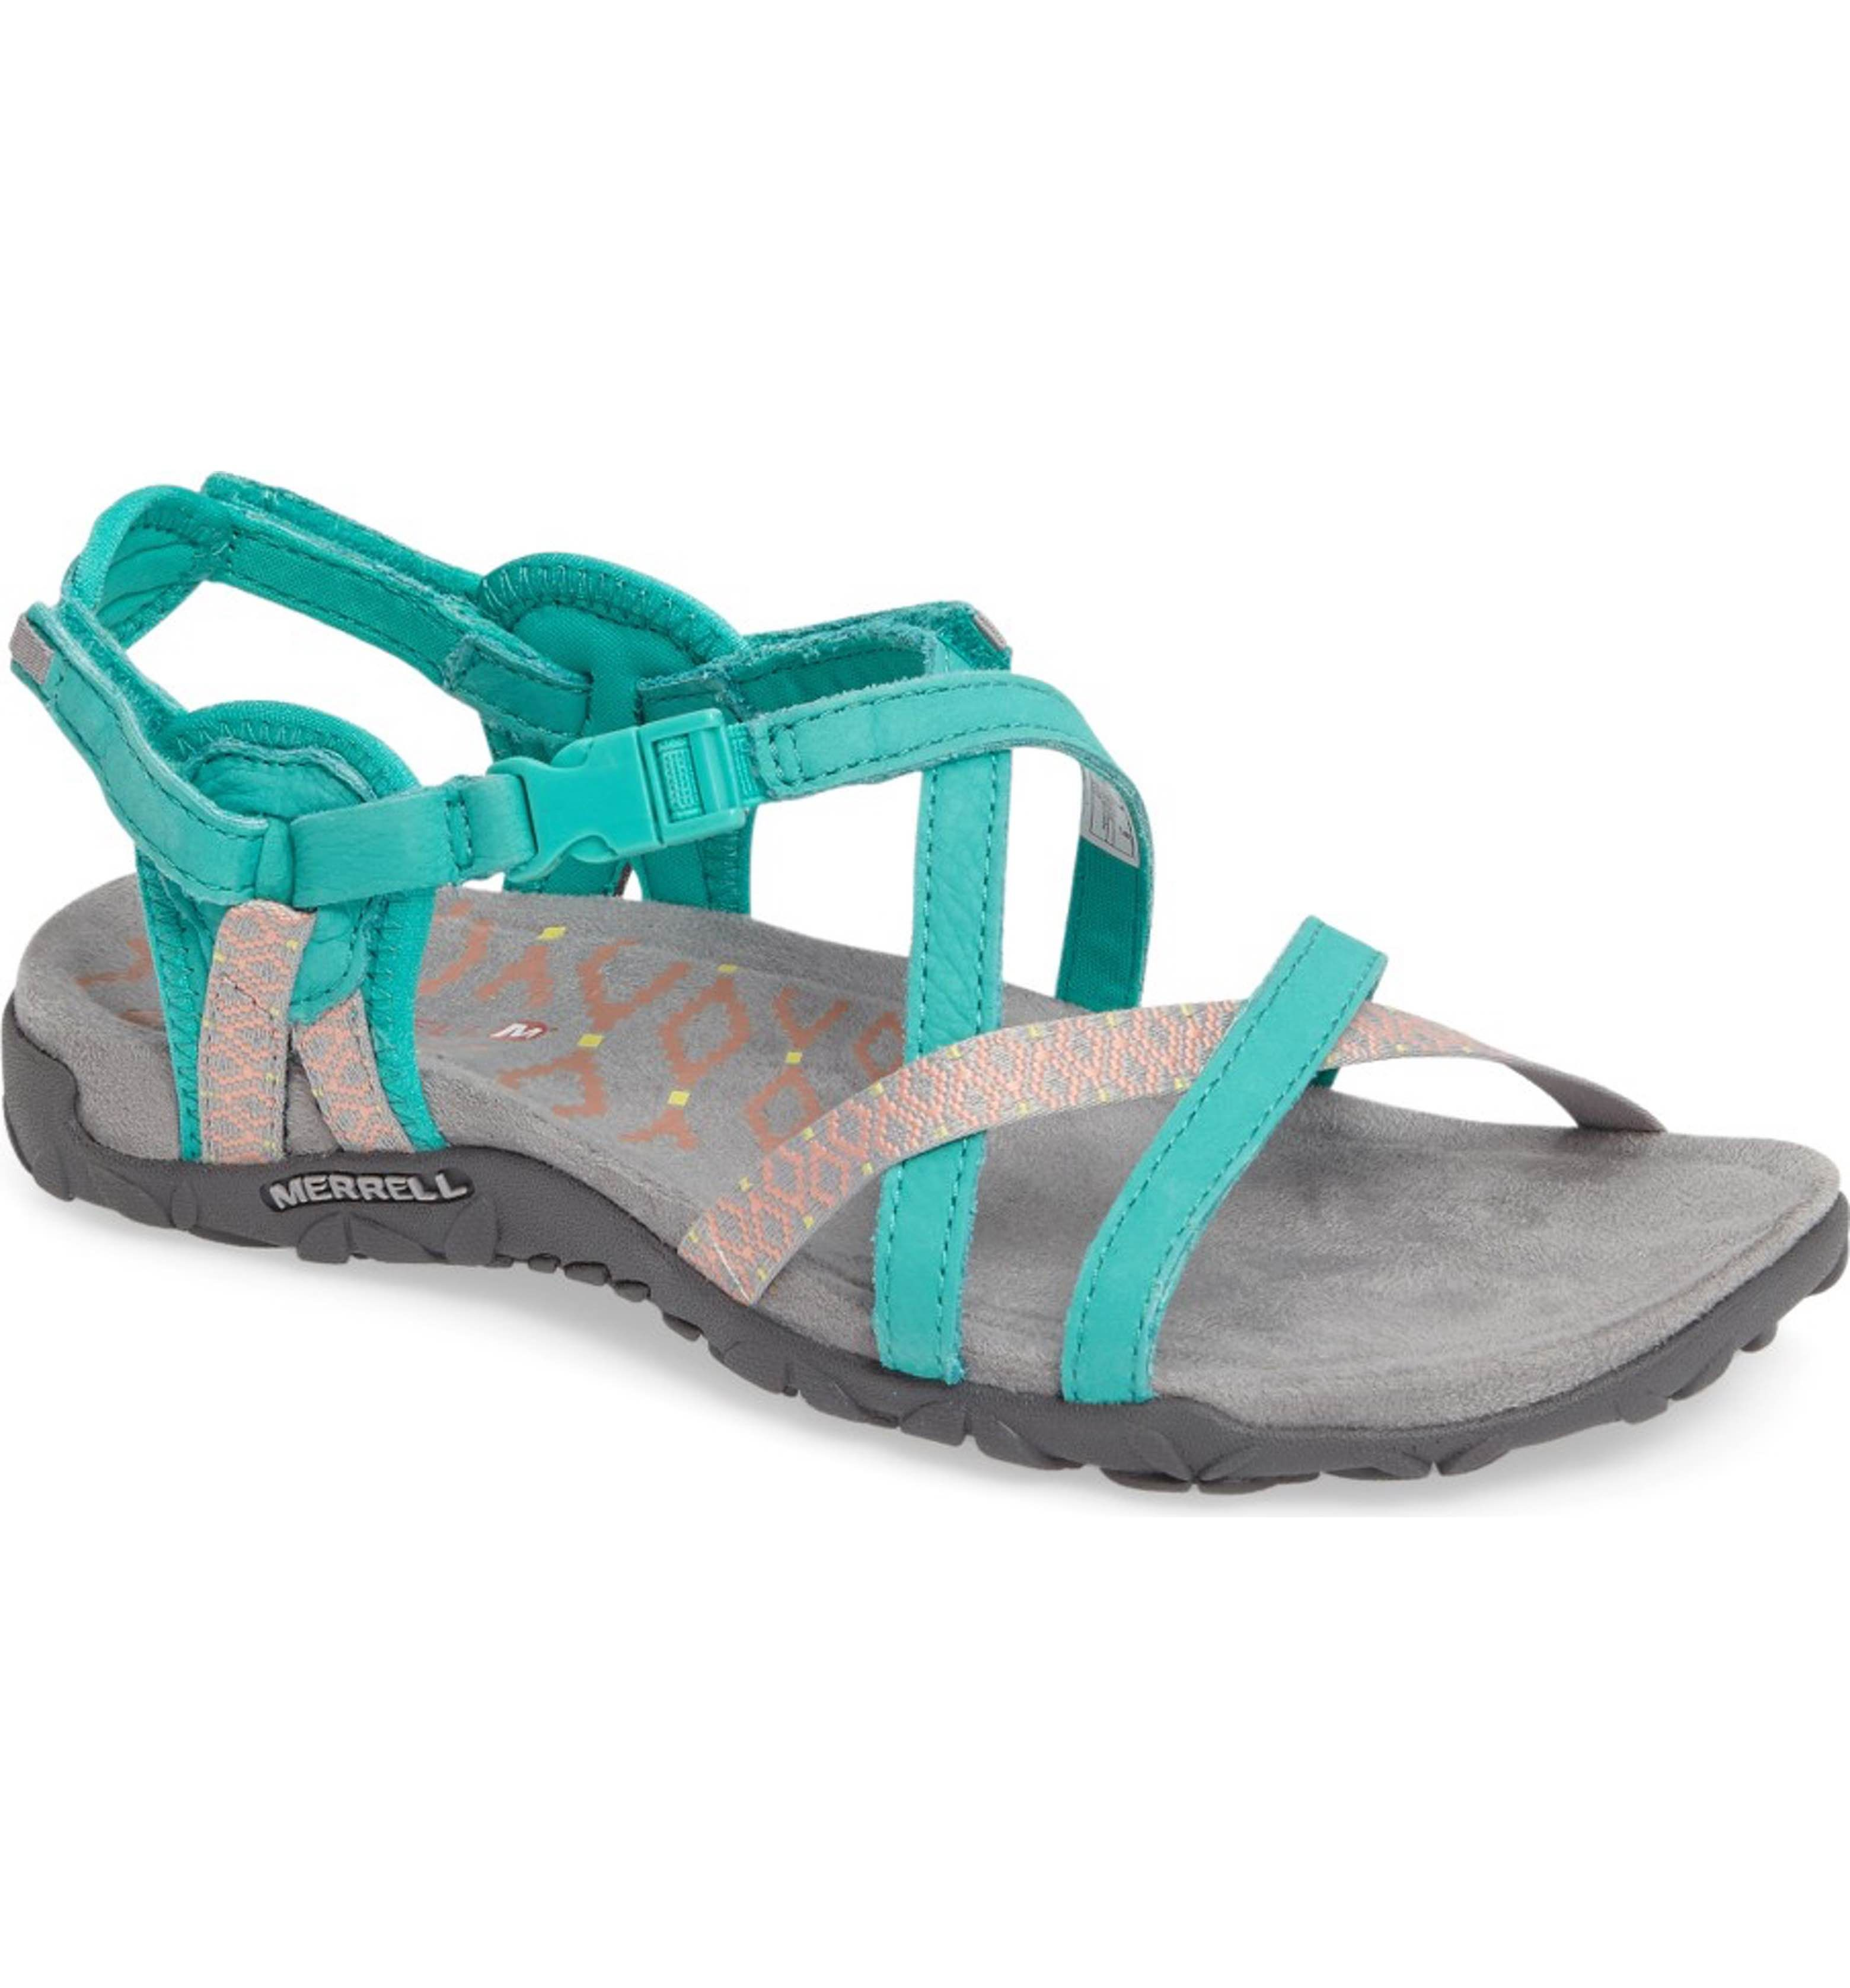 3dd8f3165445 Main Image - Merrell  Terran Lattice II  Sandal (Women)